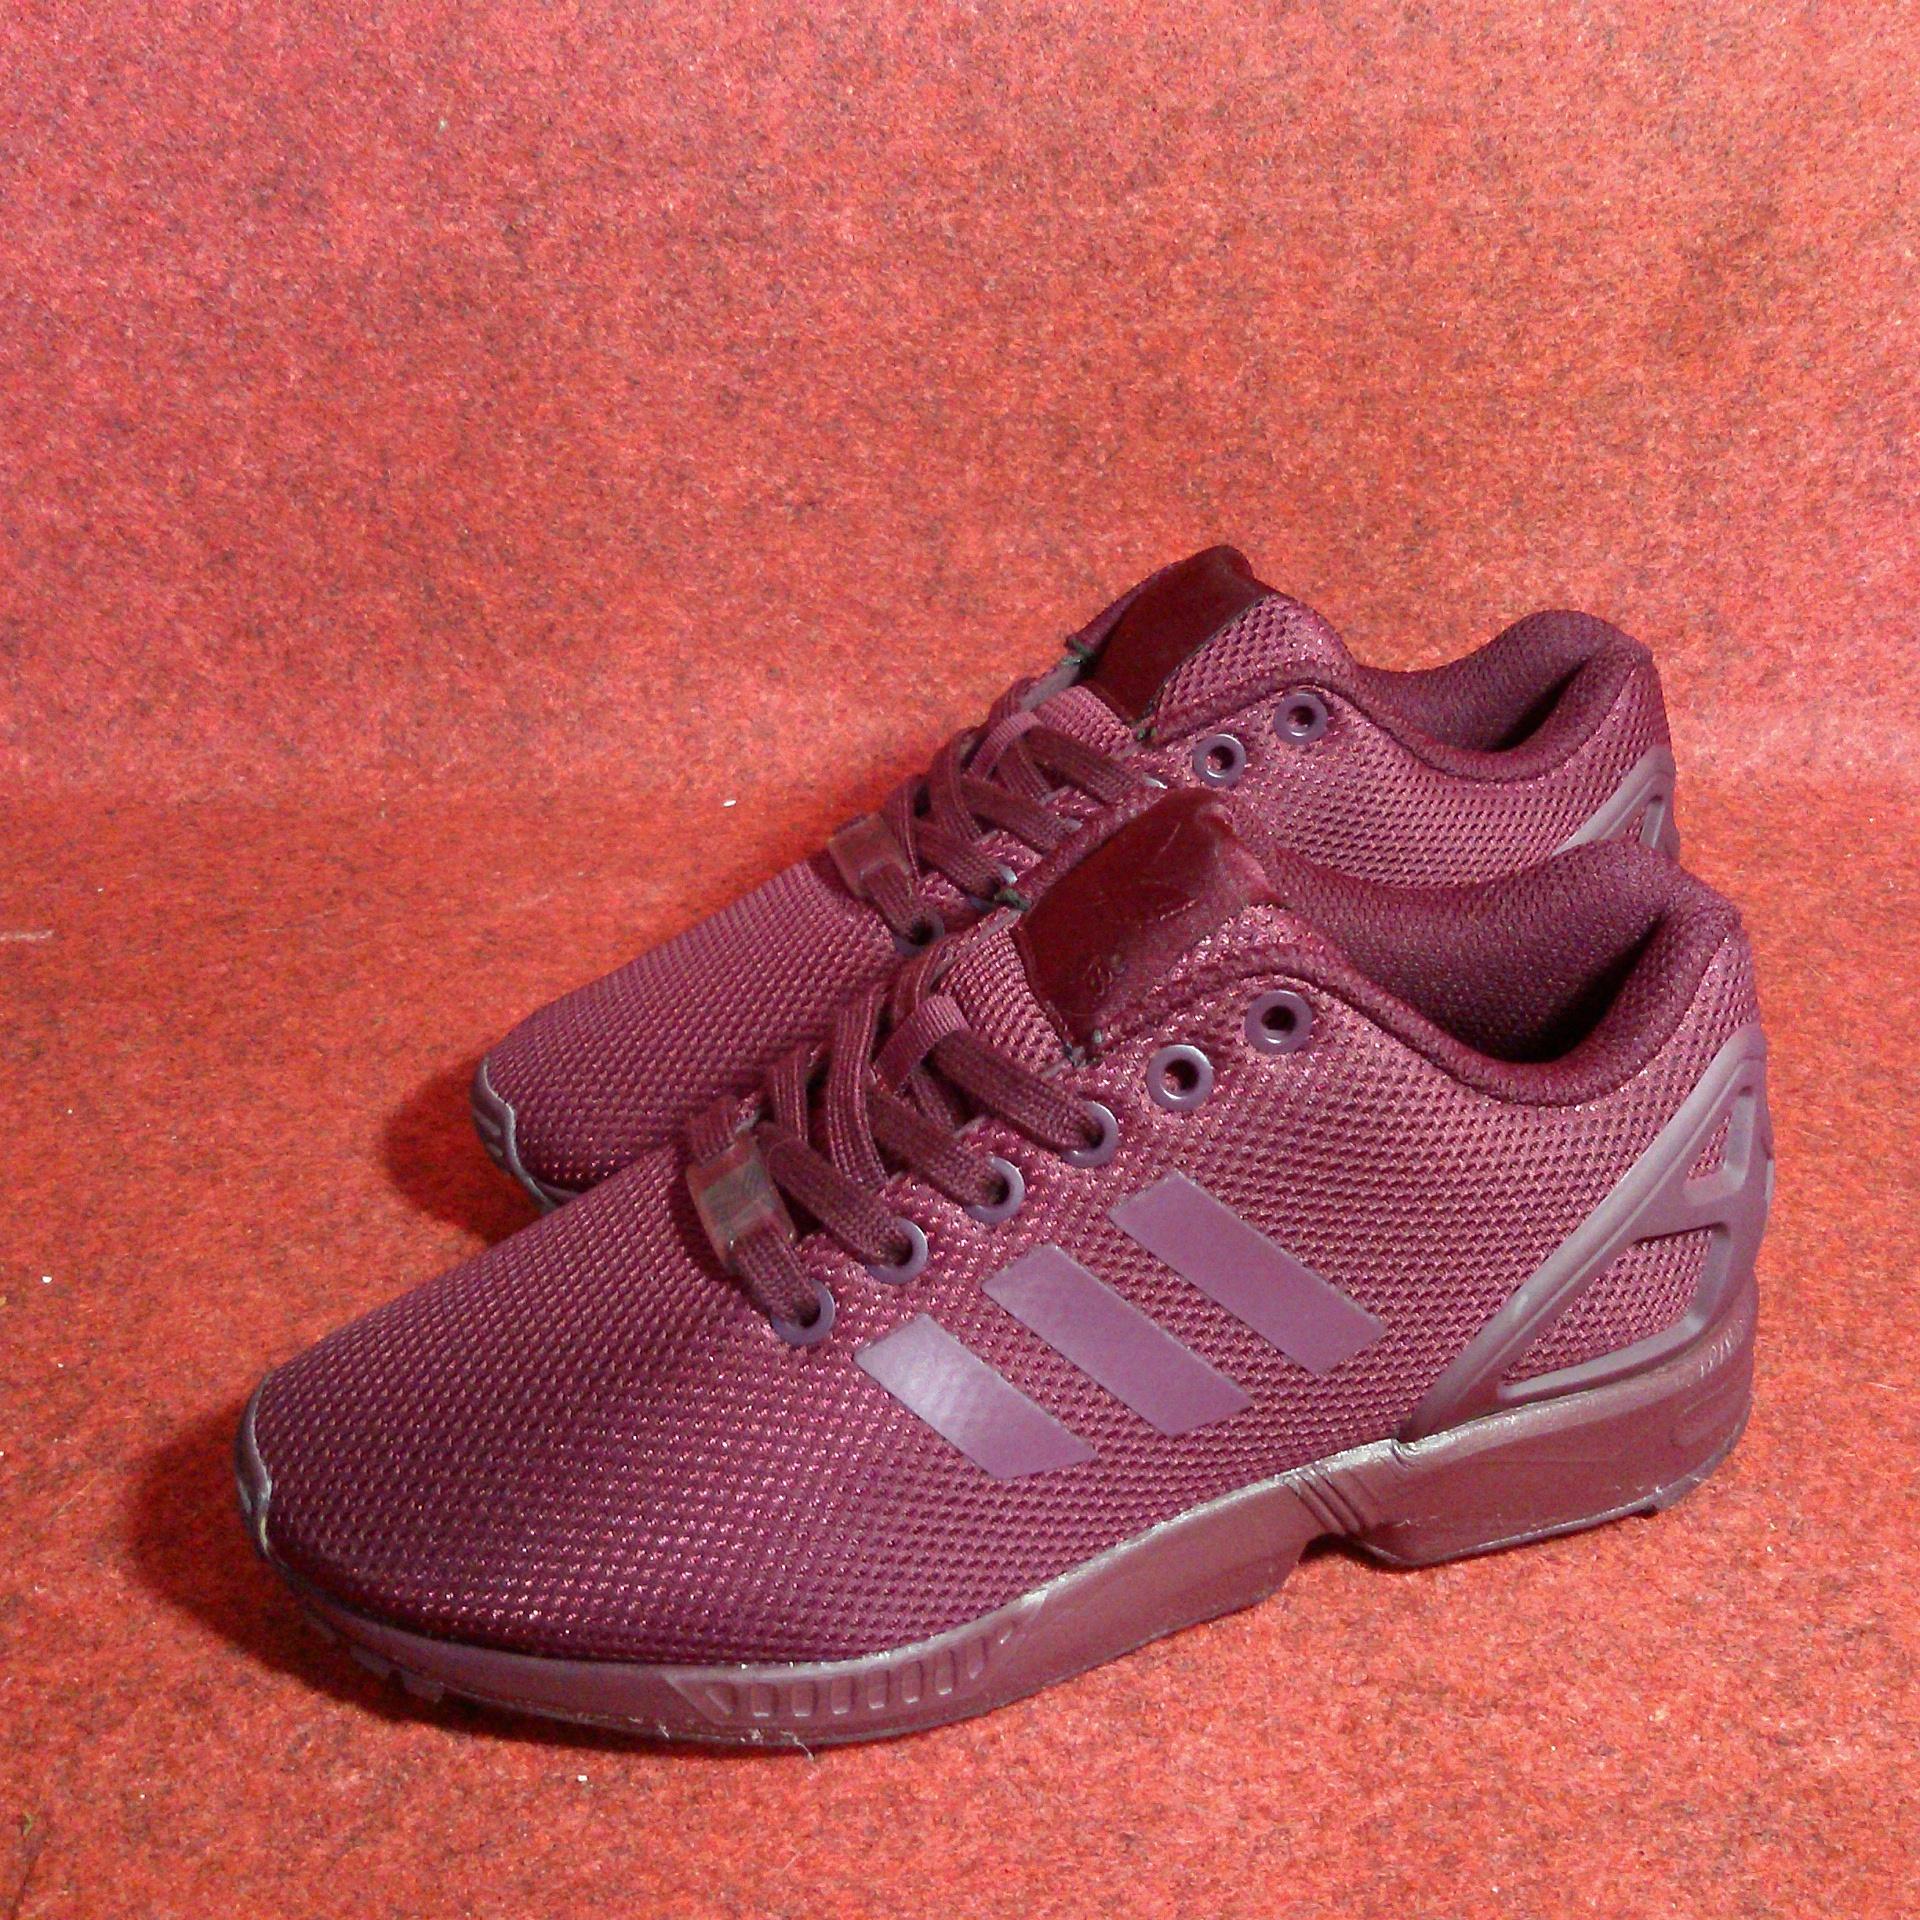 8ca3c81f02a0f discount code for harga adidas zx flux womens 7678e 3002a